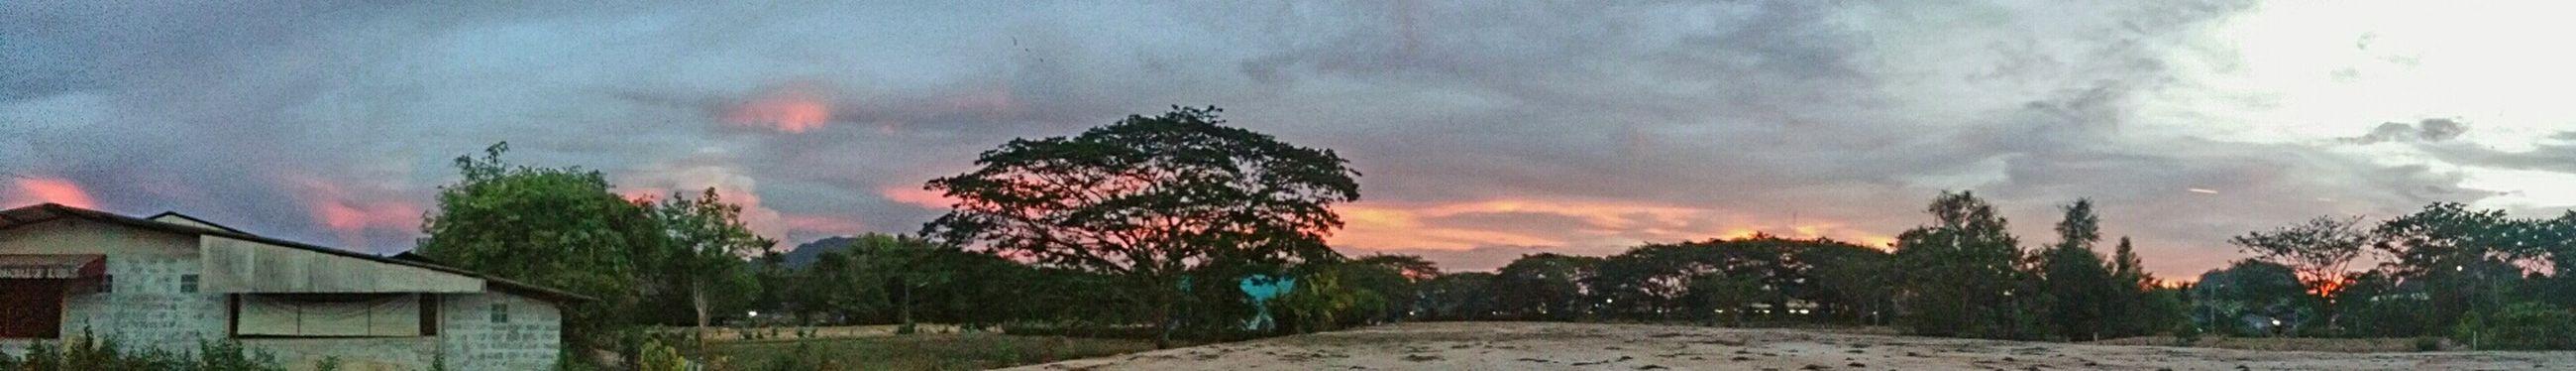 Panaroma Nature Sunset Clouds And Sky